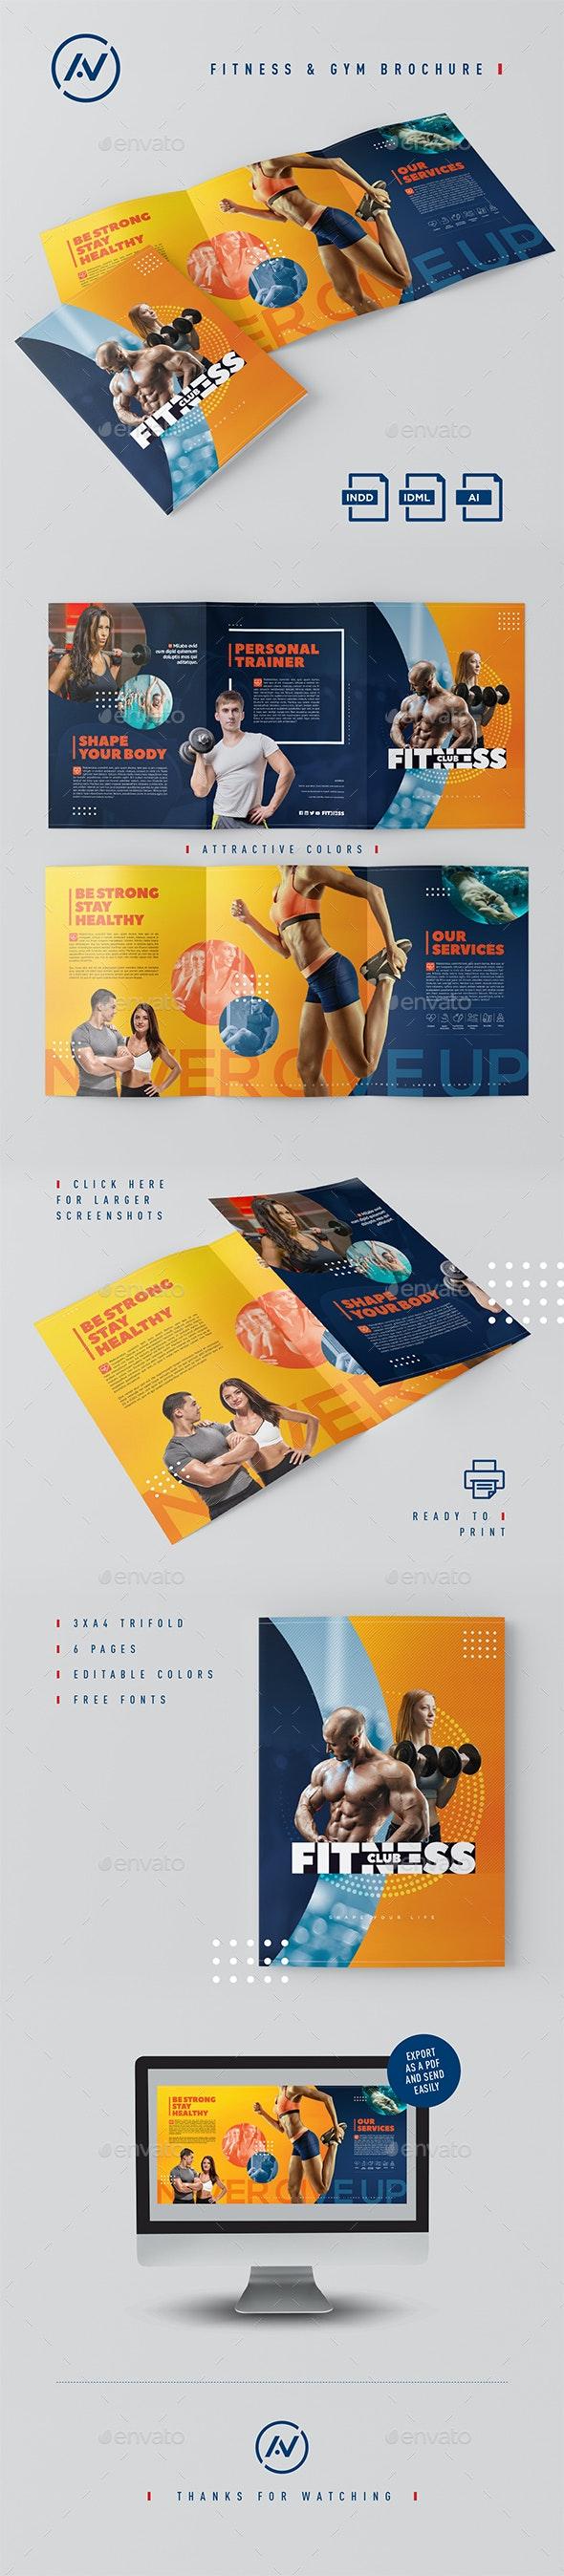 Fitness & Gym Brochure - Print Templates